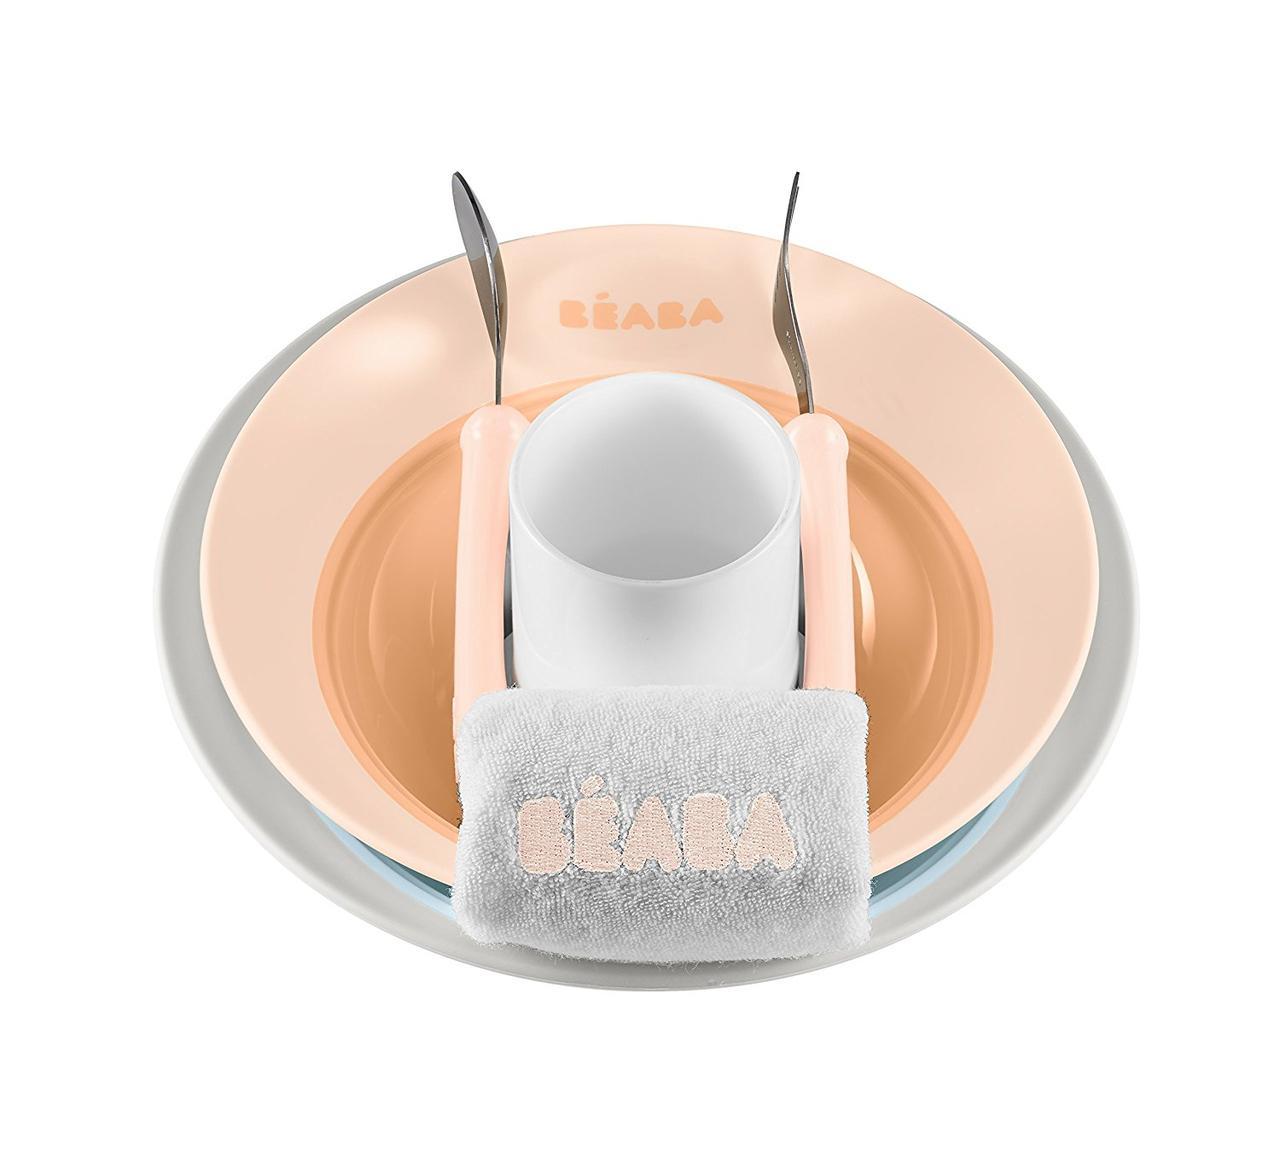 Набір посуду Beaba nude, арт. 913397